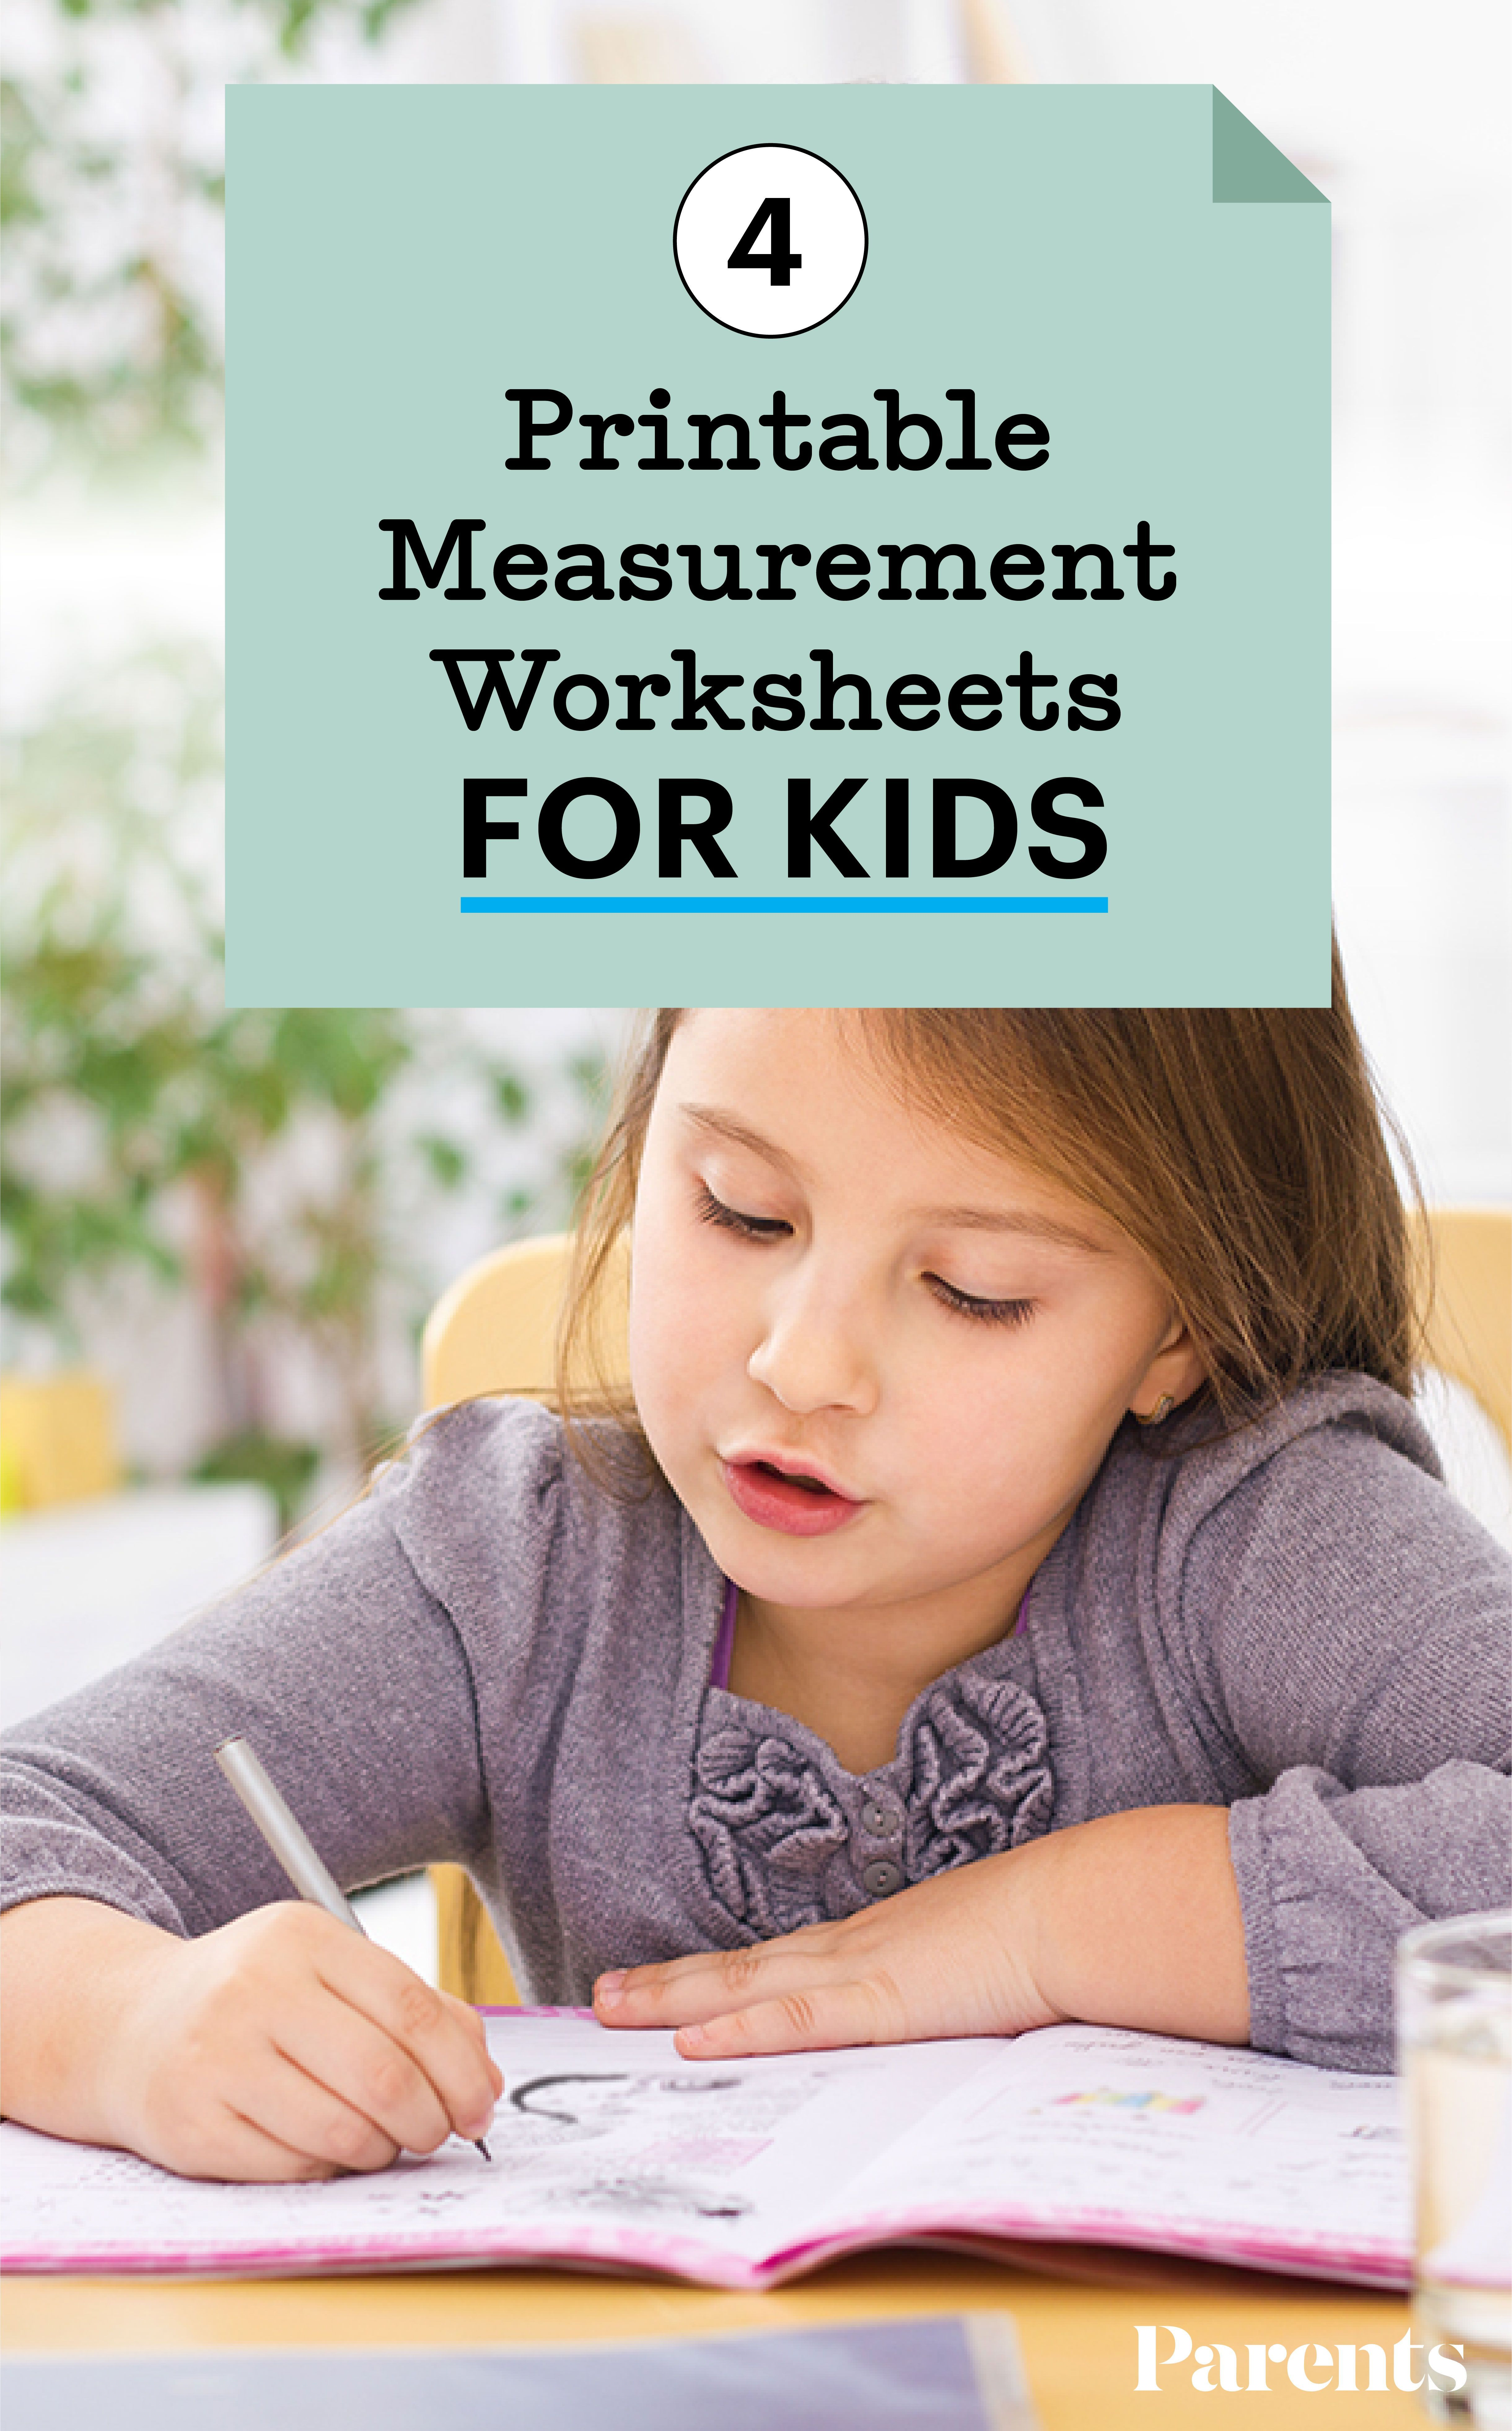 4 Printable Measurement Worksheets For Kids In